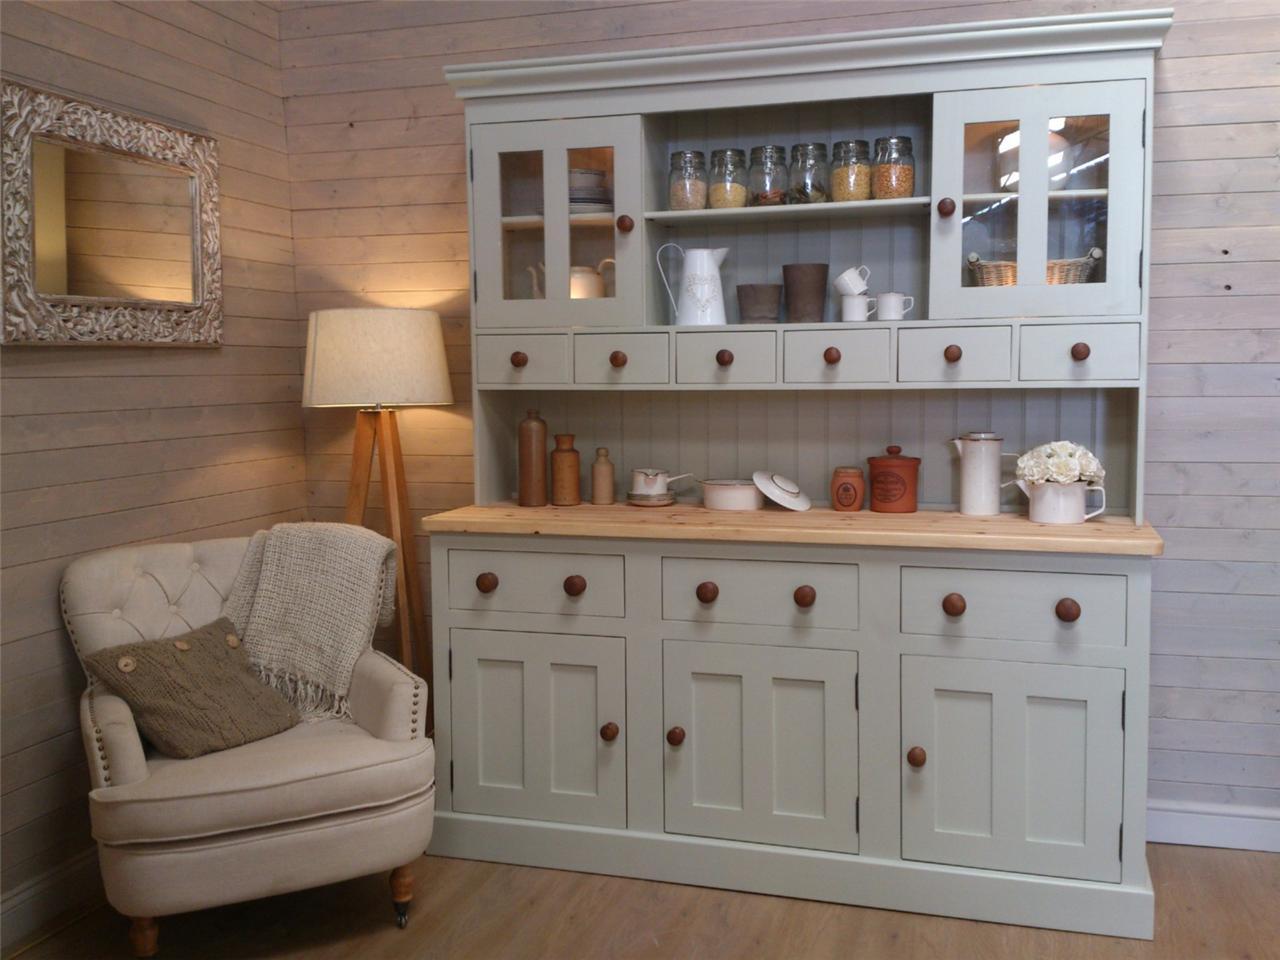 Sofa furniture kitchen January 2014